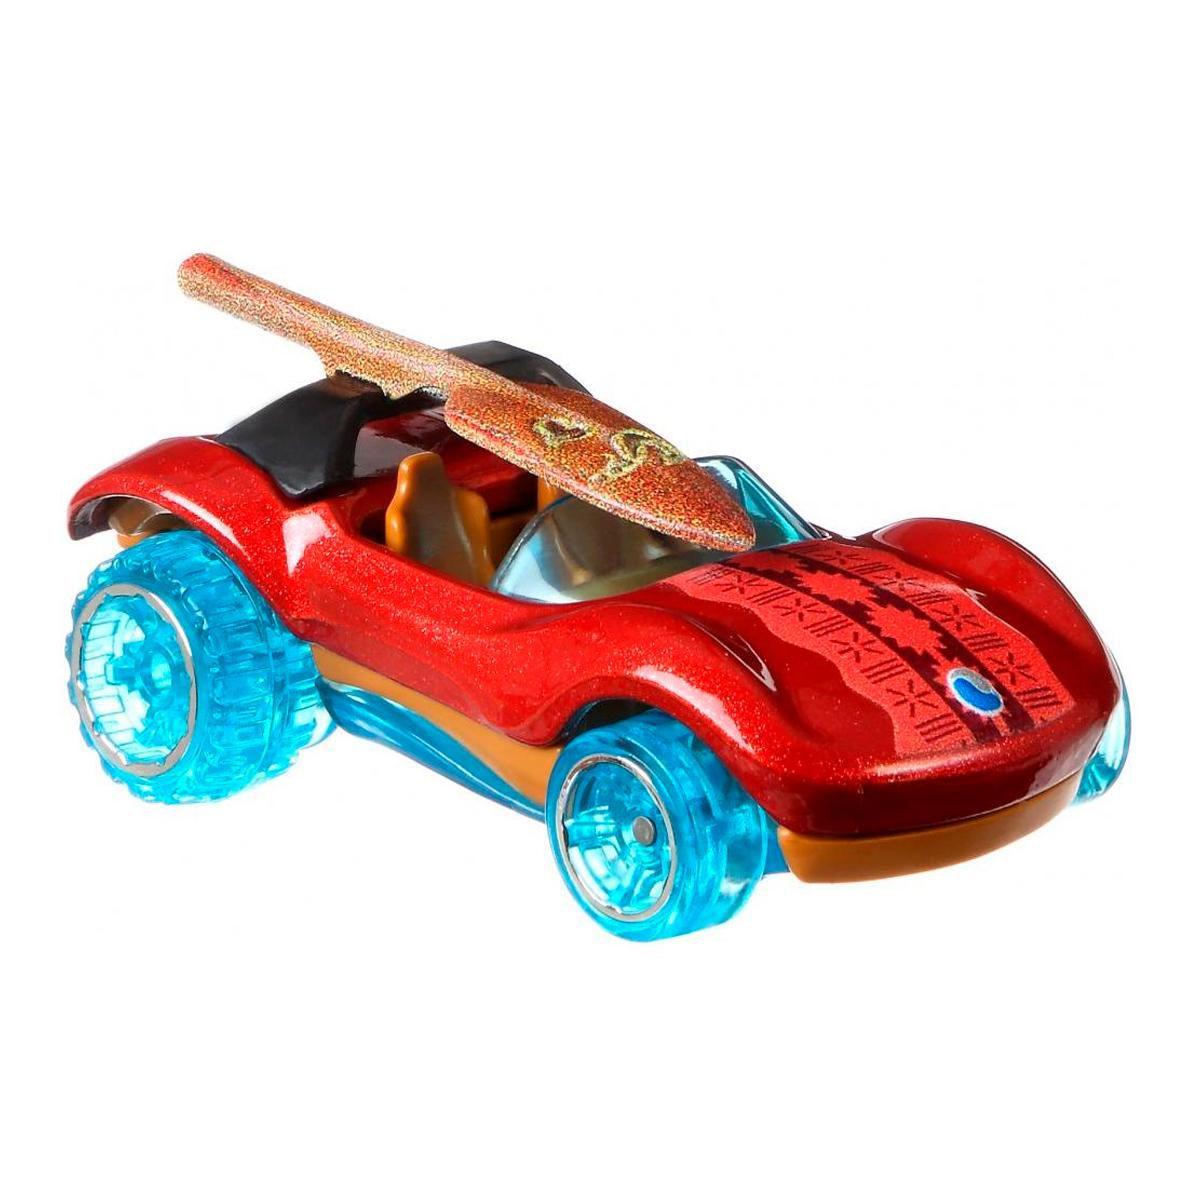 Carrinho Hot Wheels Moana: Disney (Series 4) - Mattel